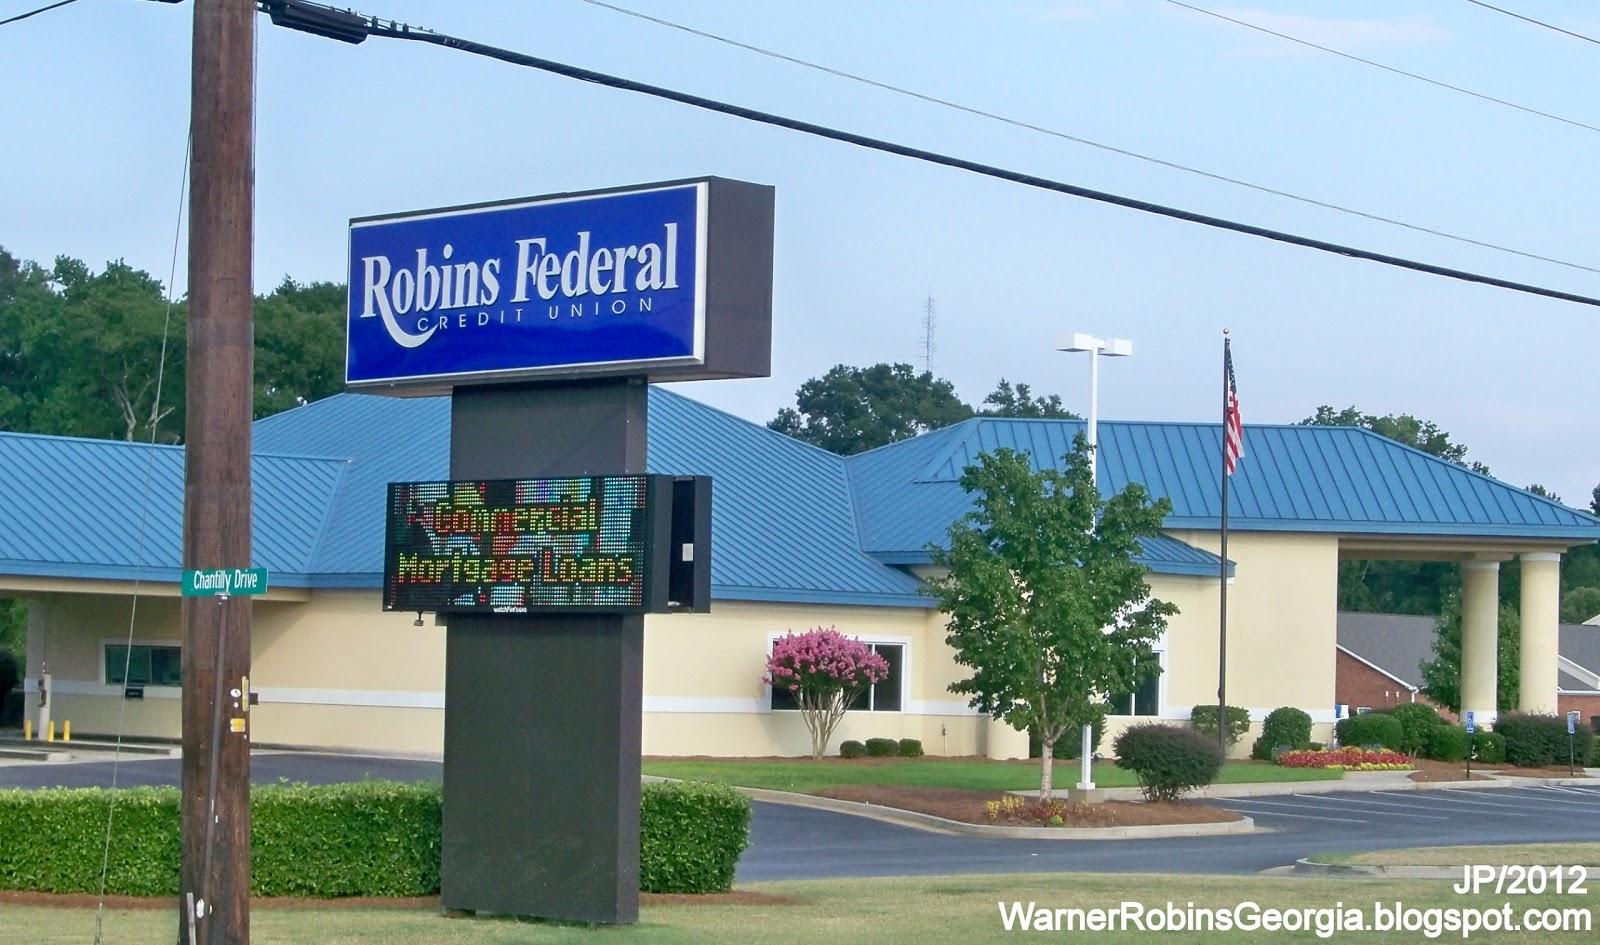 Warner robins georgia air force base houston restaurant bank attorney